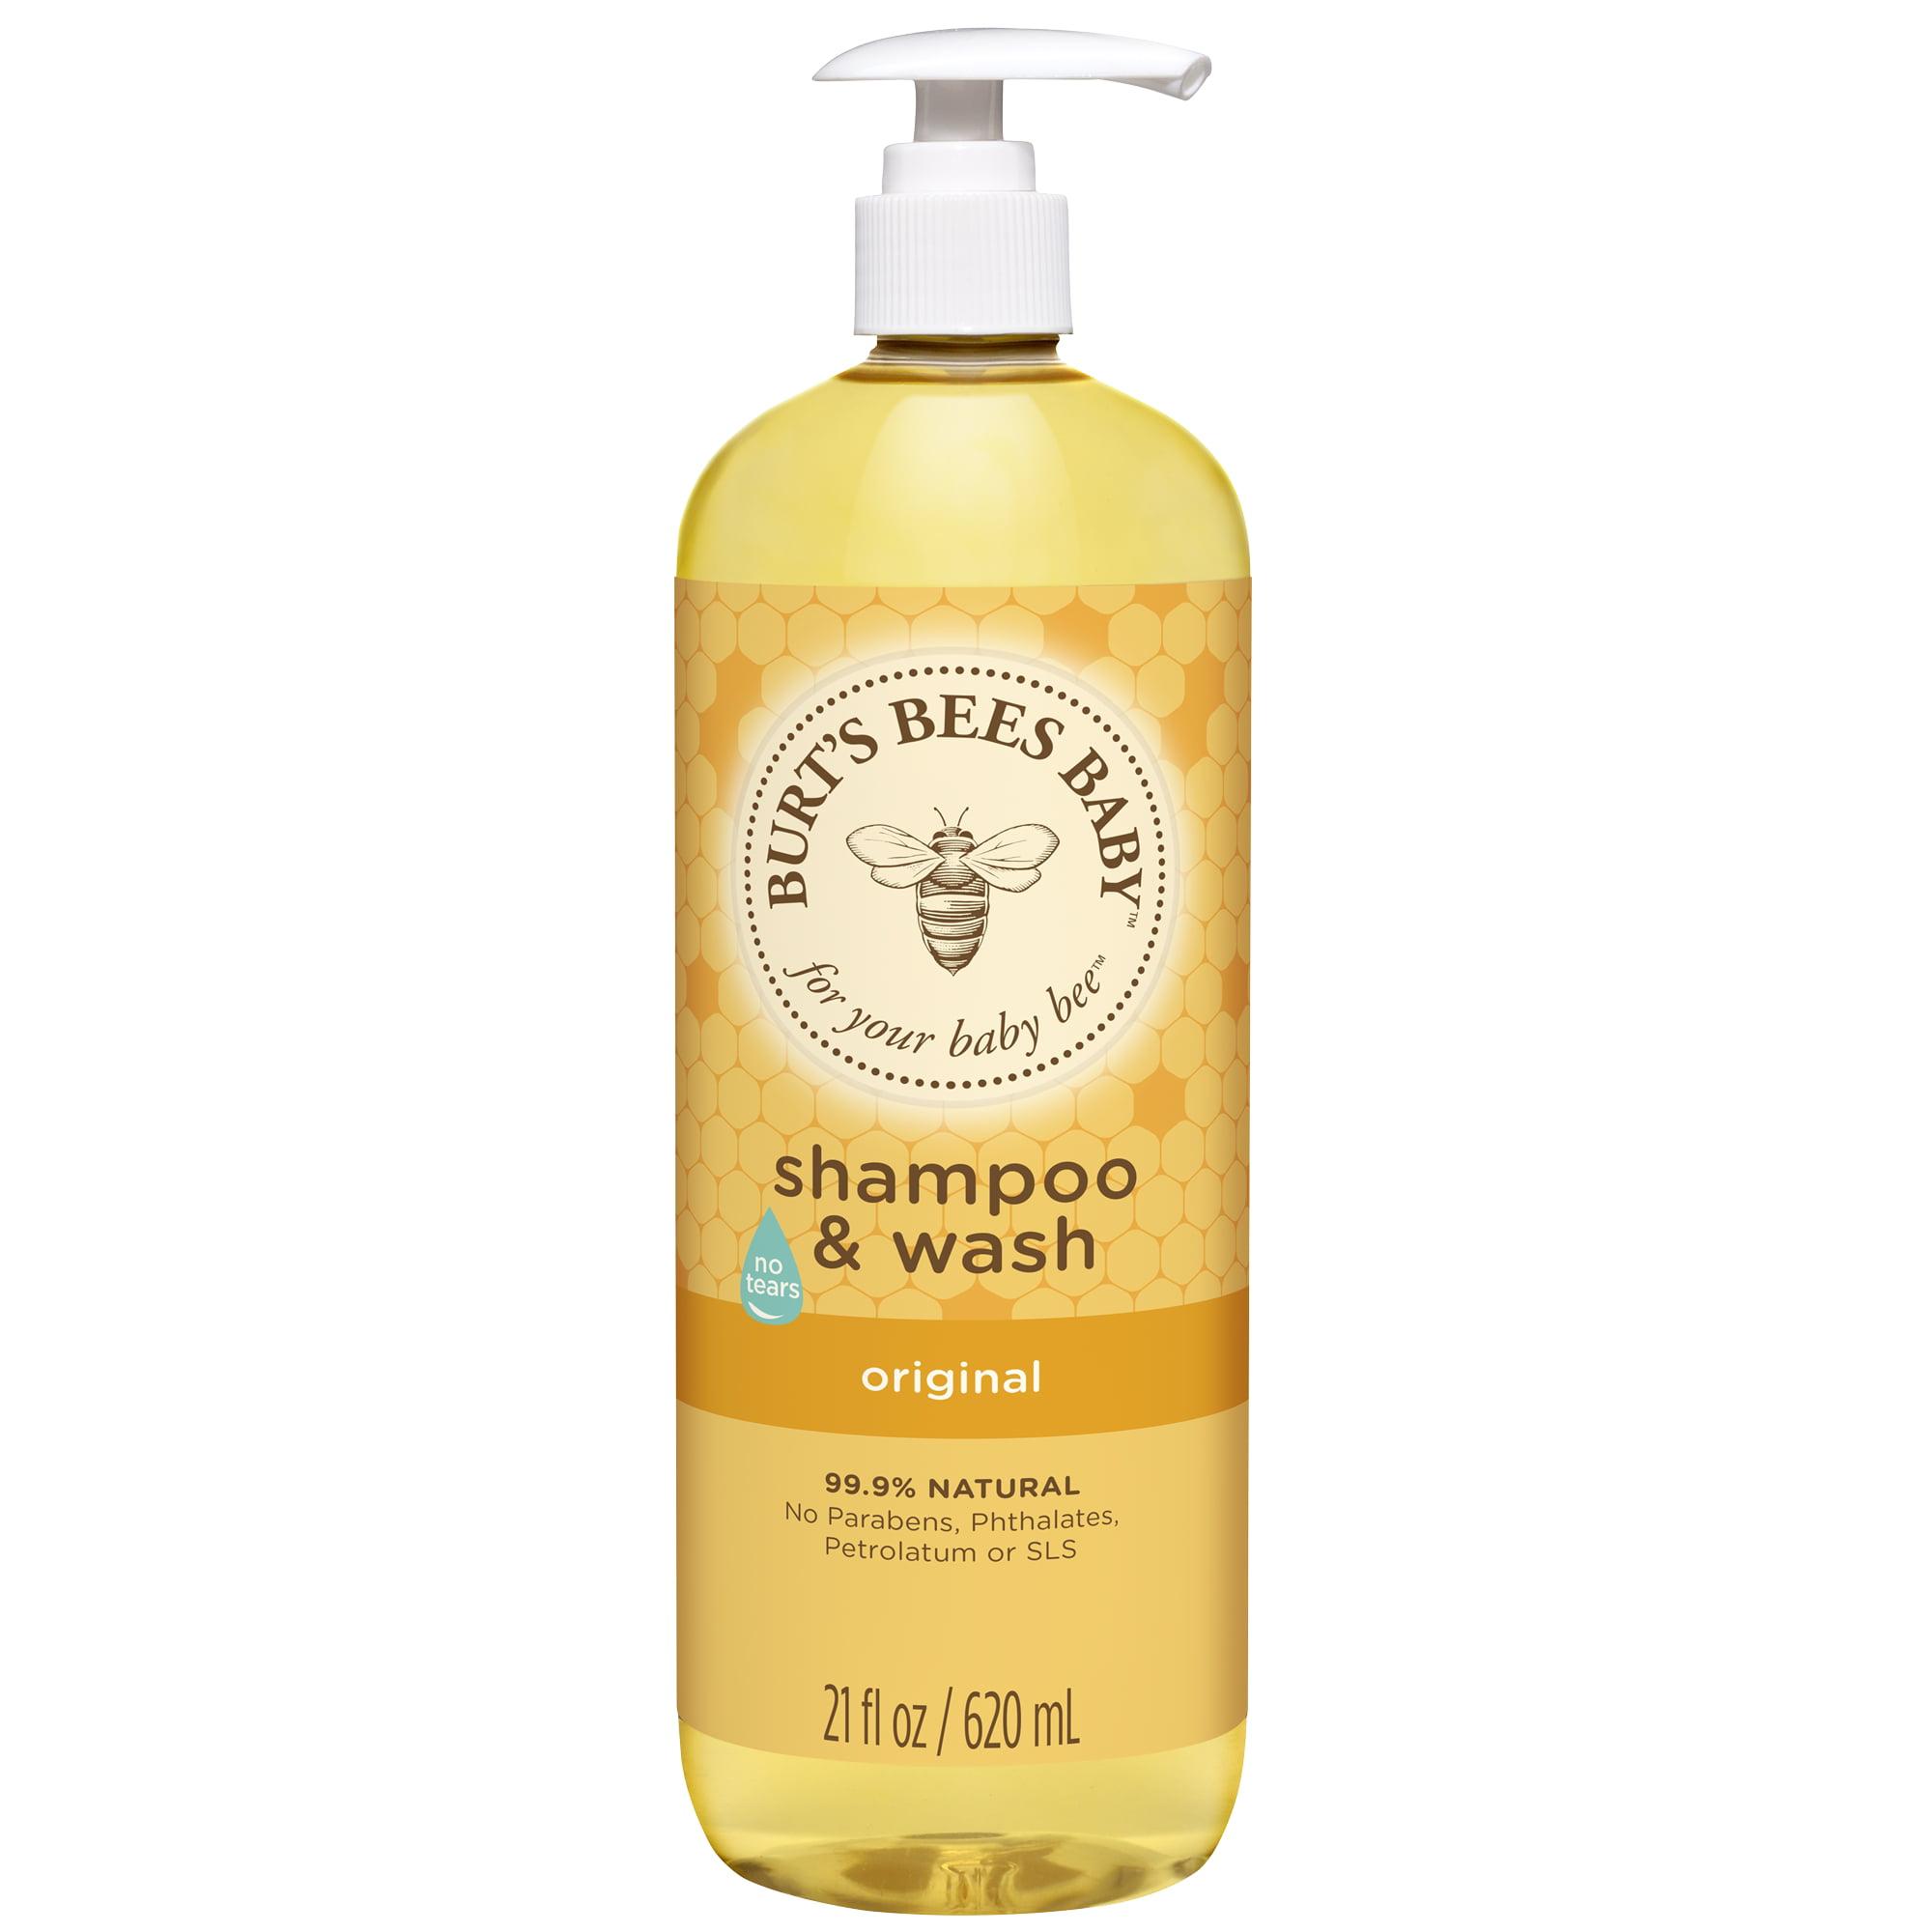 Burt's bees baby shampoo & wash, 21 ounces